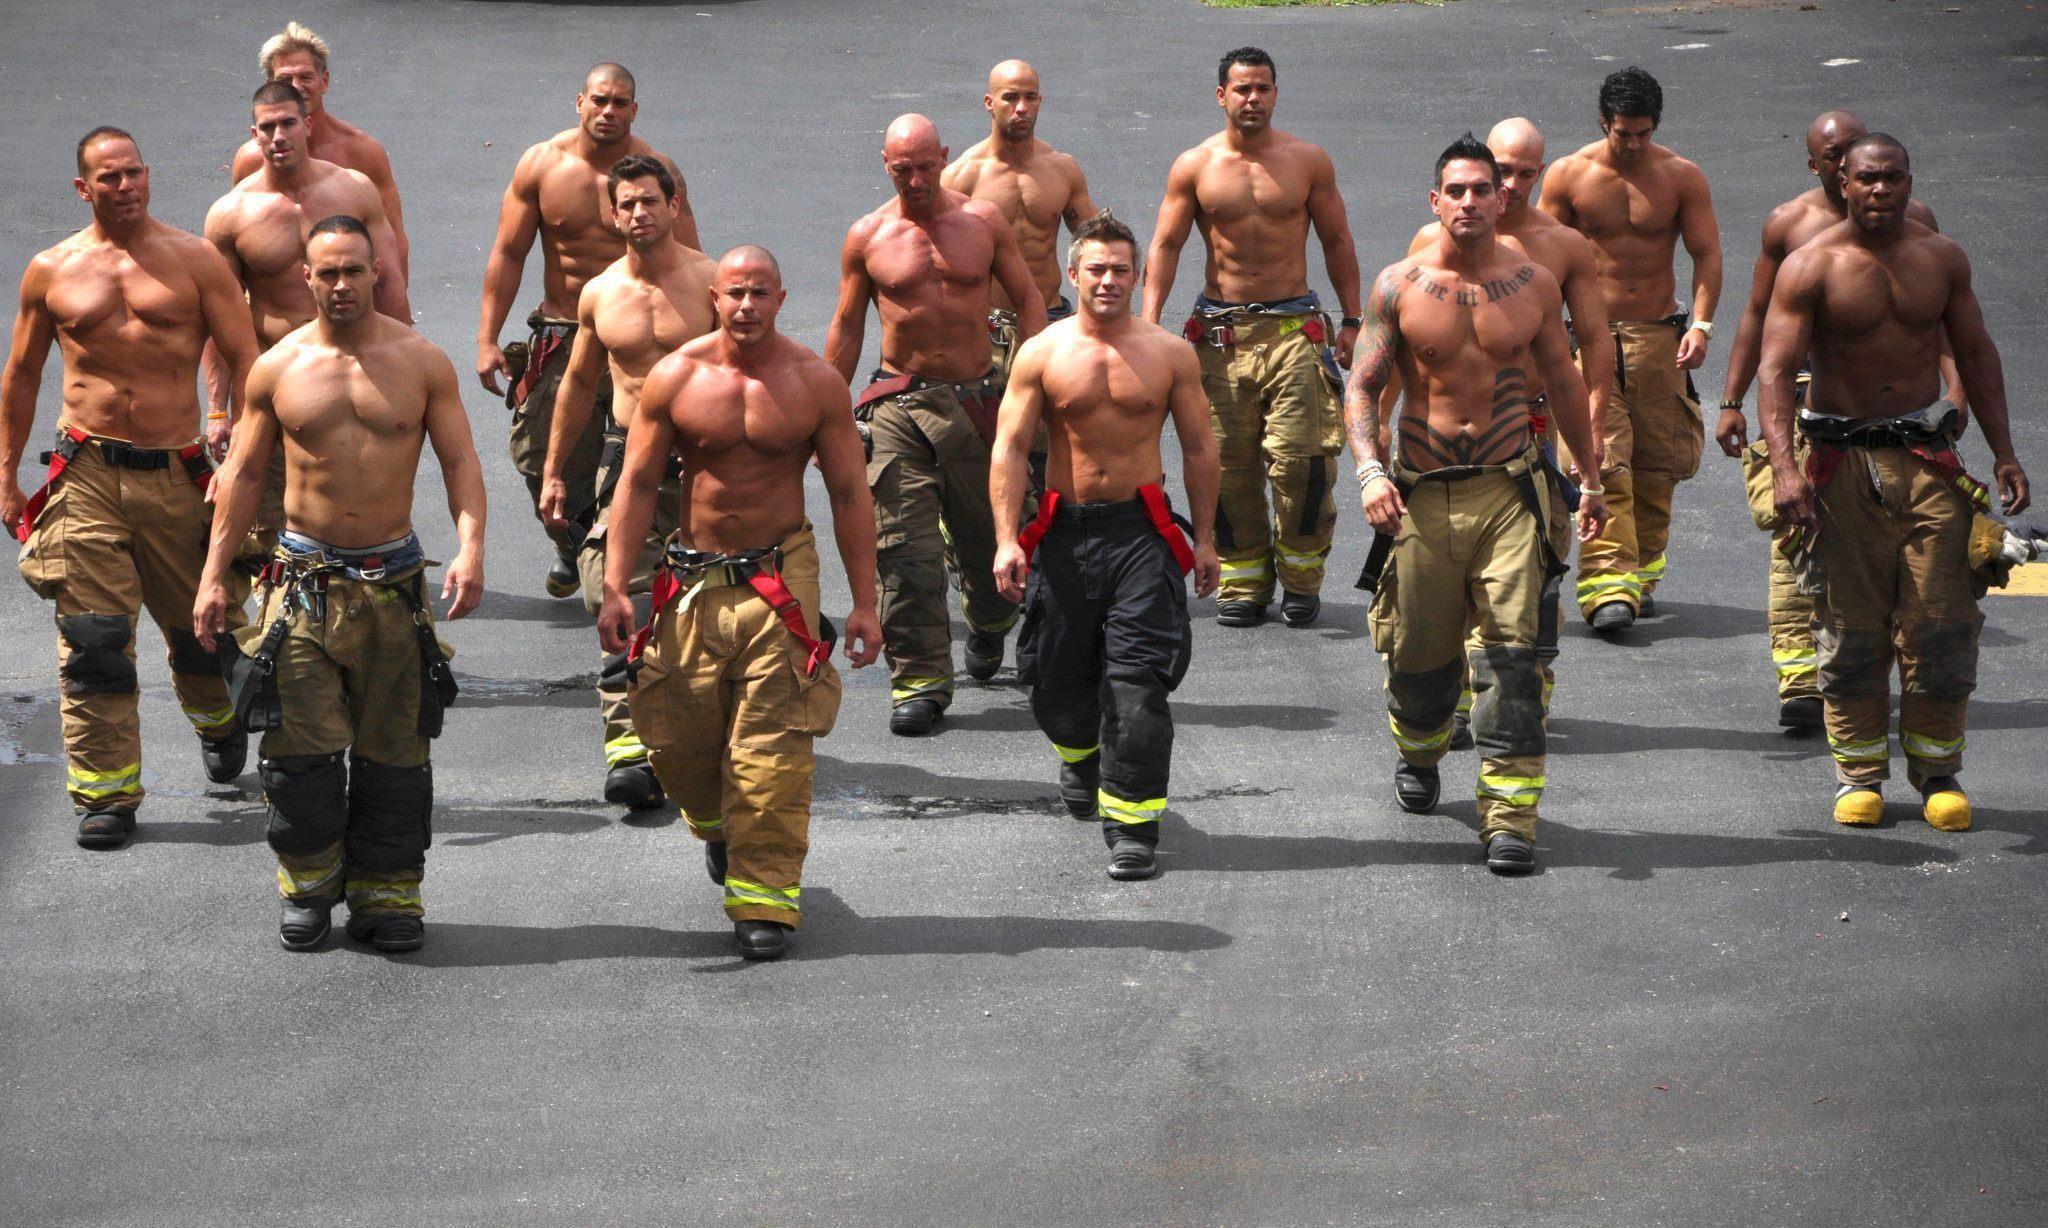 Hello Firemen Chicagofire Hot Firemen Men In Uniform Hot Firefighters